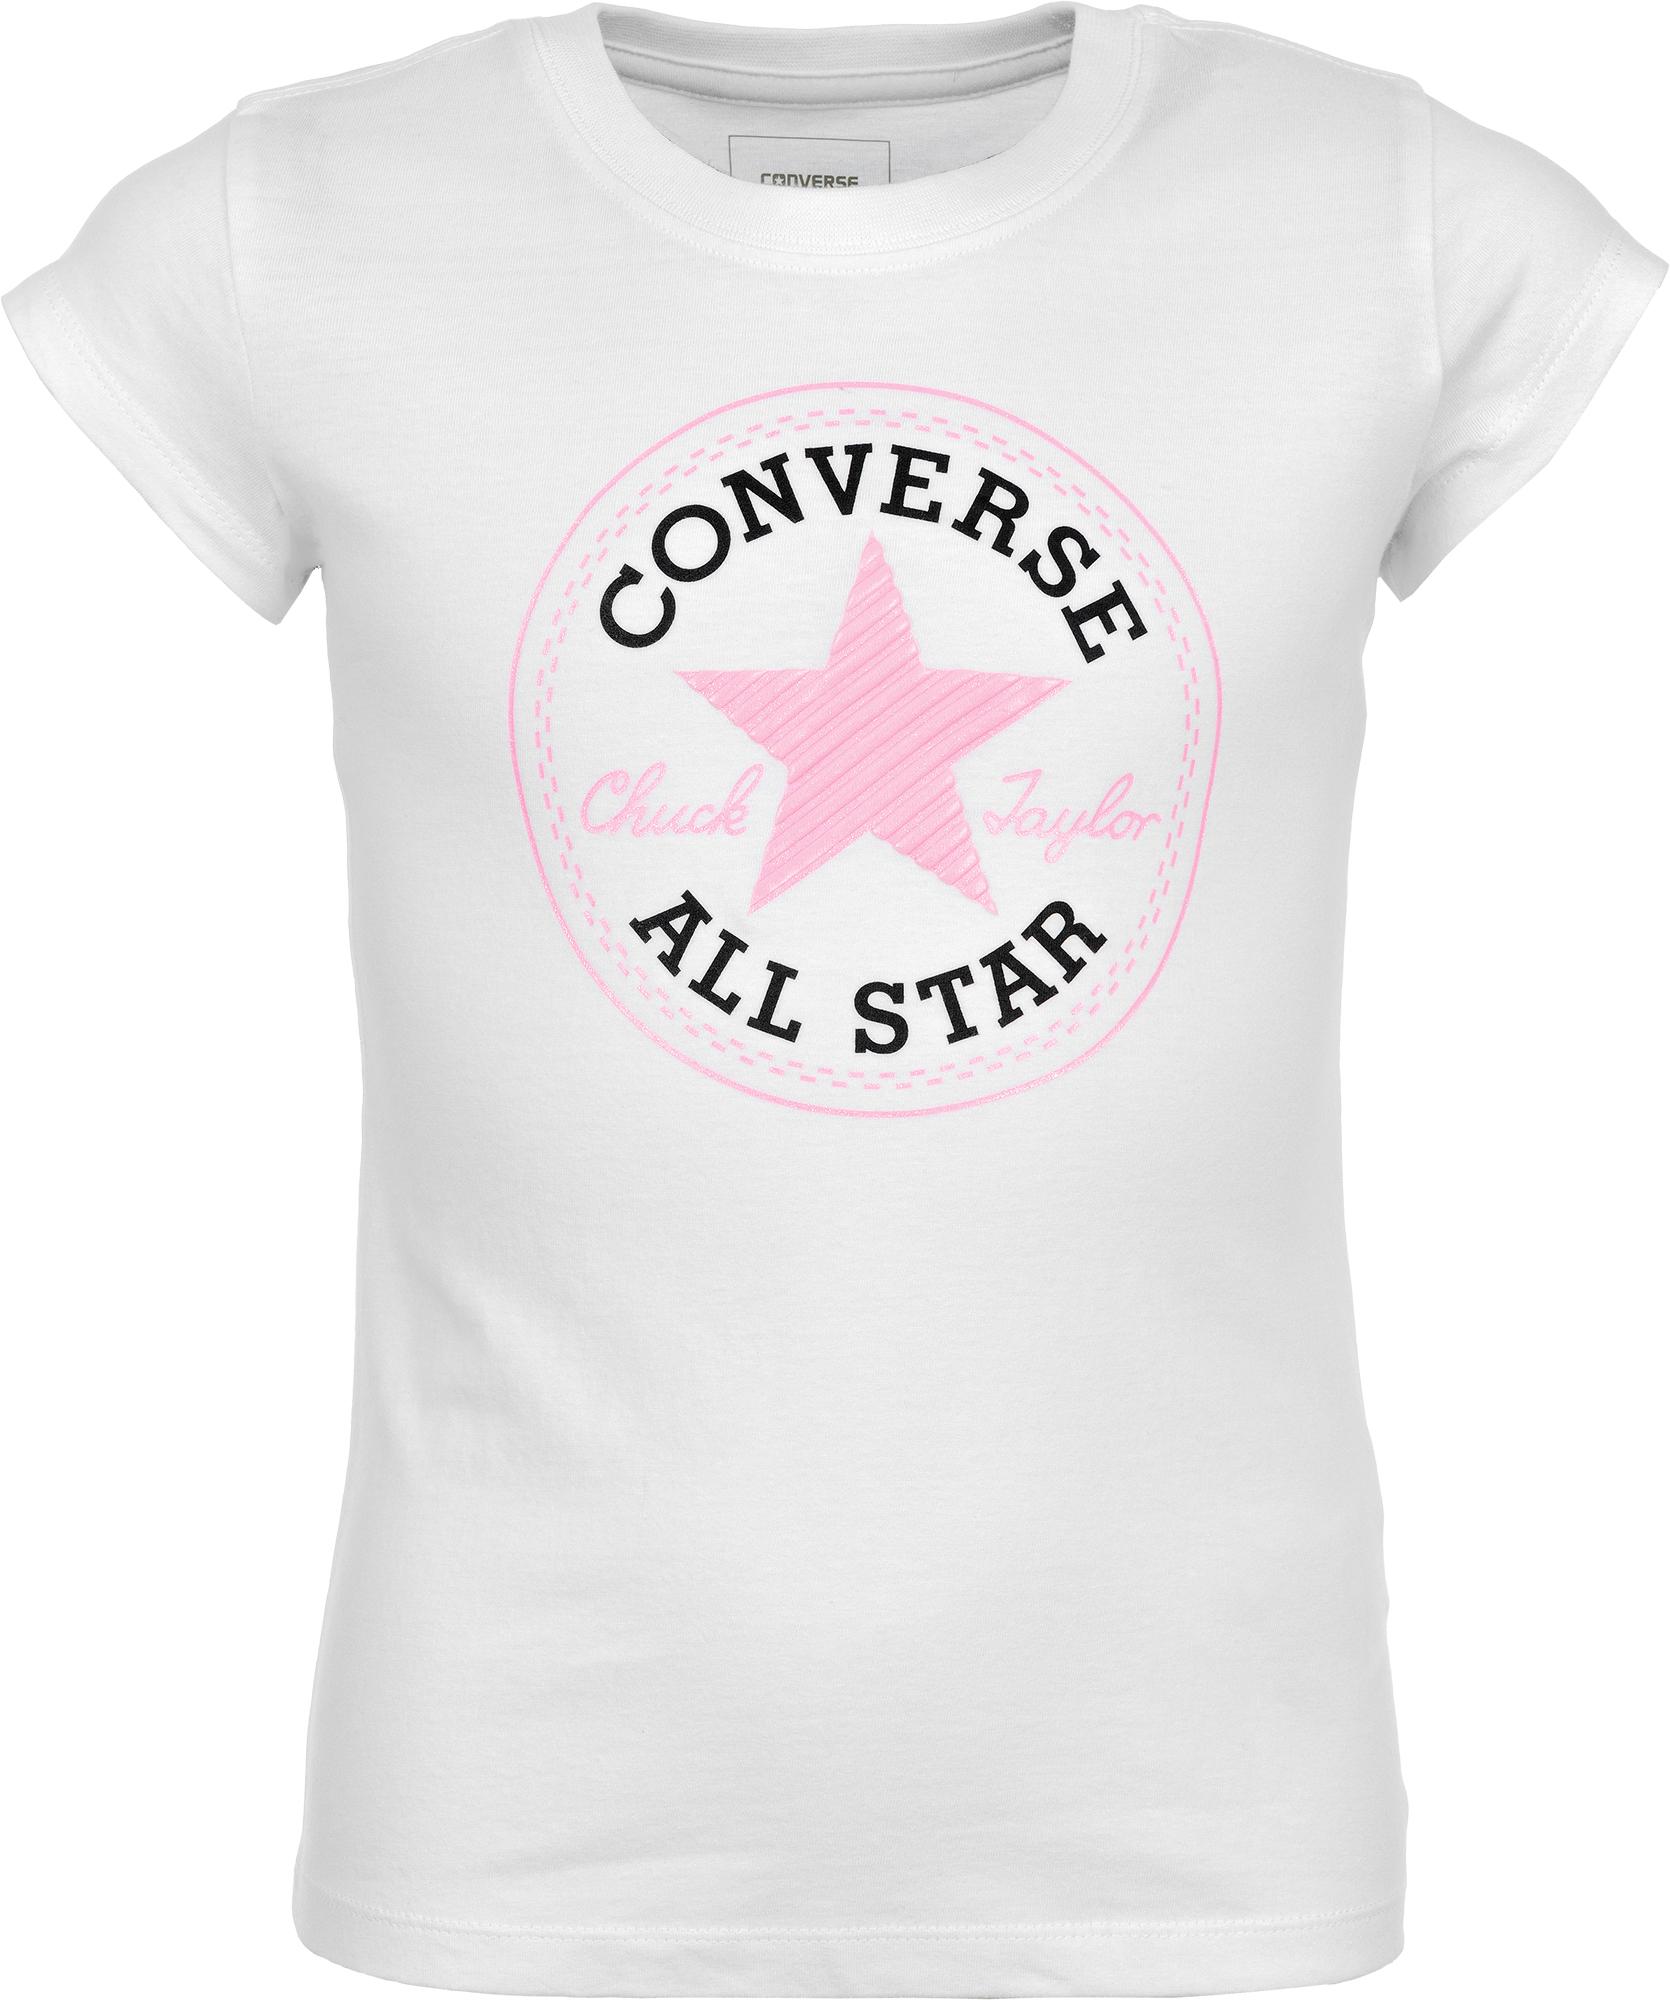 Converse Футболка для девочек Converse